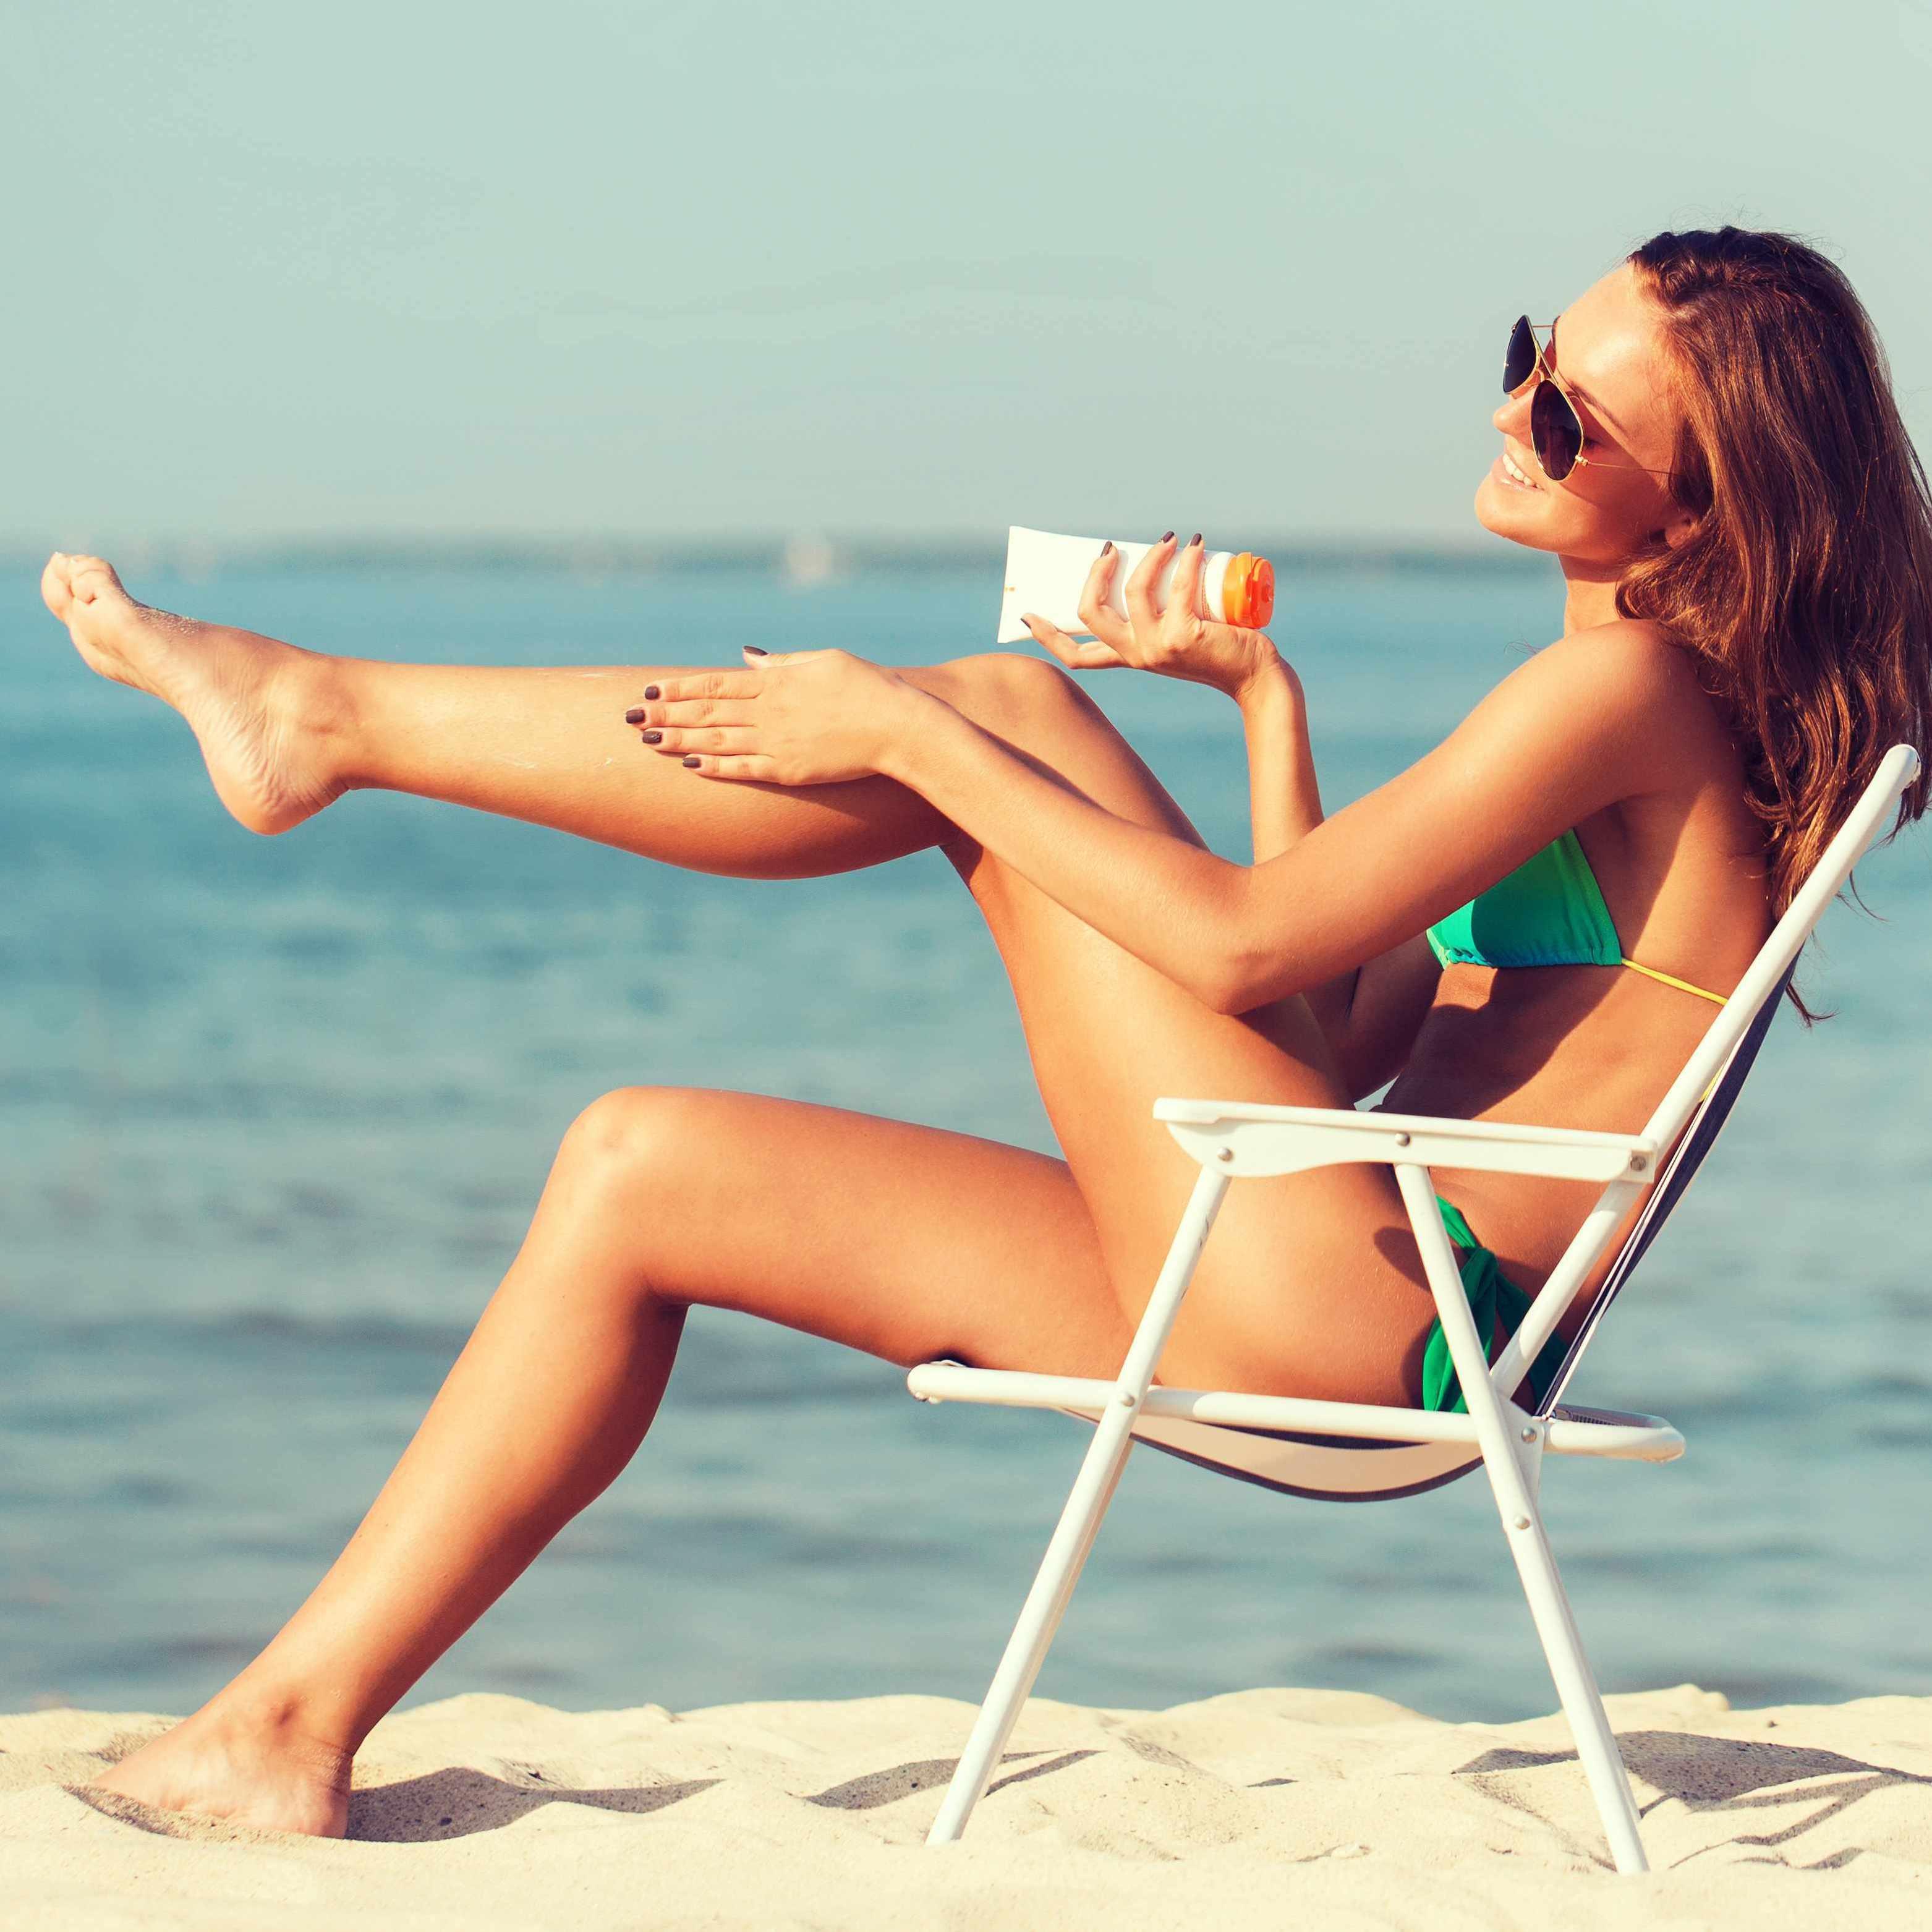 Women applying sun tan lotion and sunbathing on beach